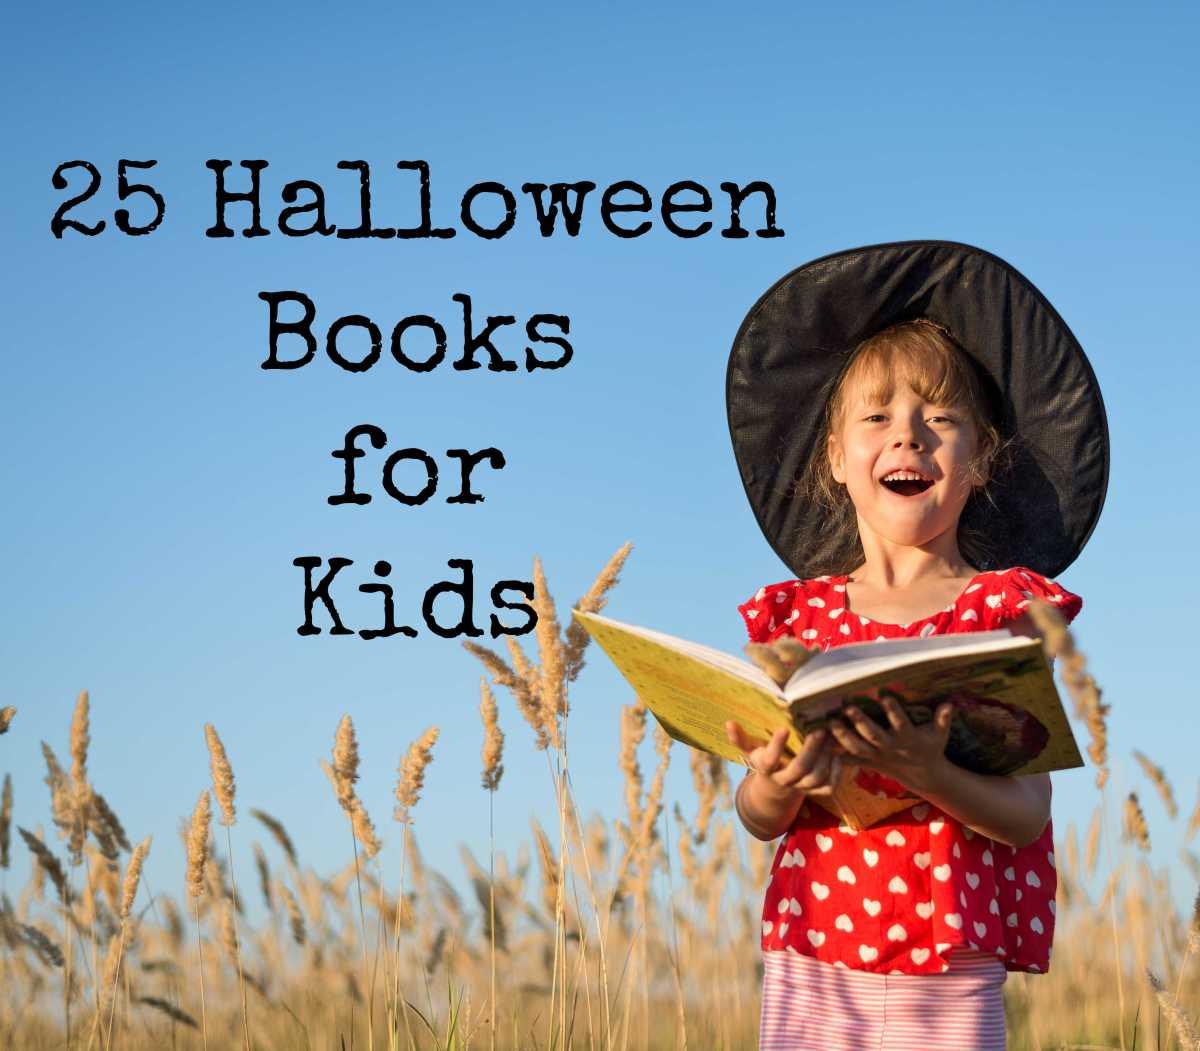 25 Halloween Books forKids